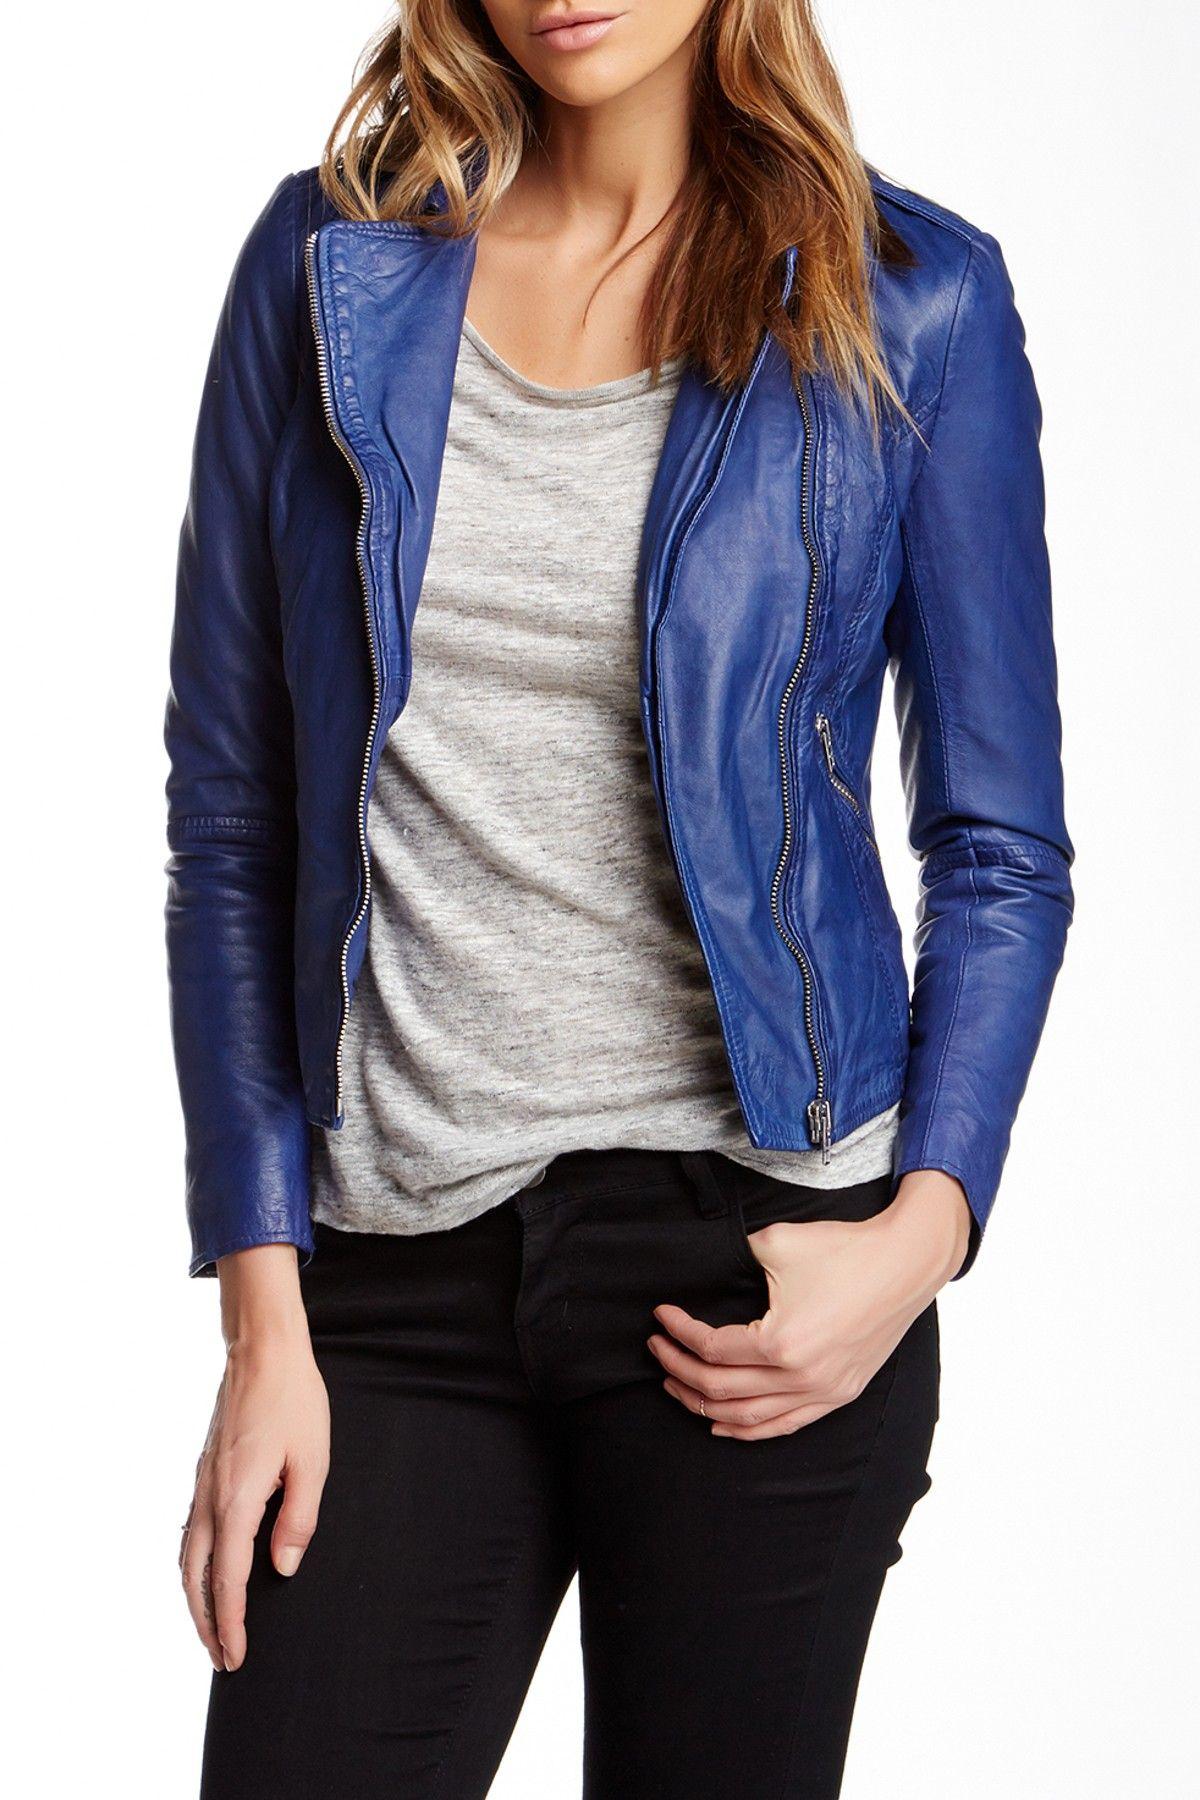 Muubaa Carmona Leather Biker Jacket (With images) Blue